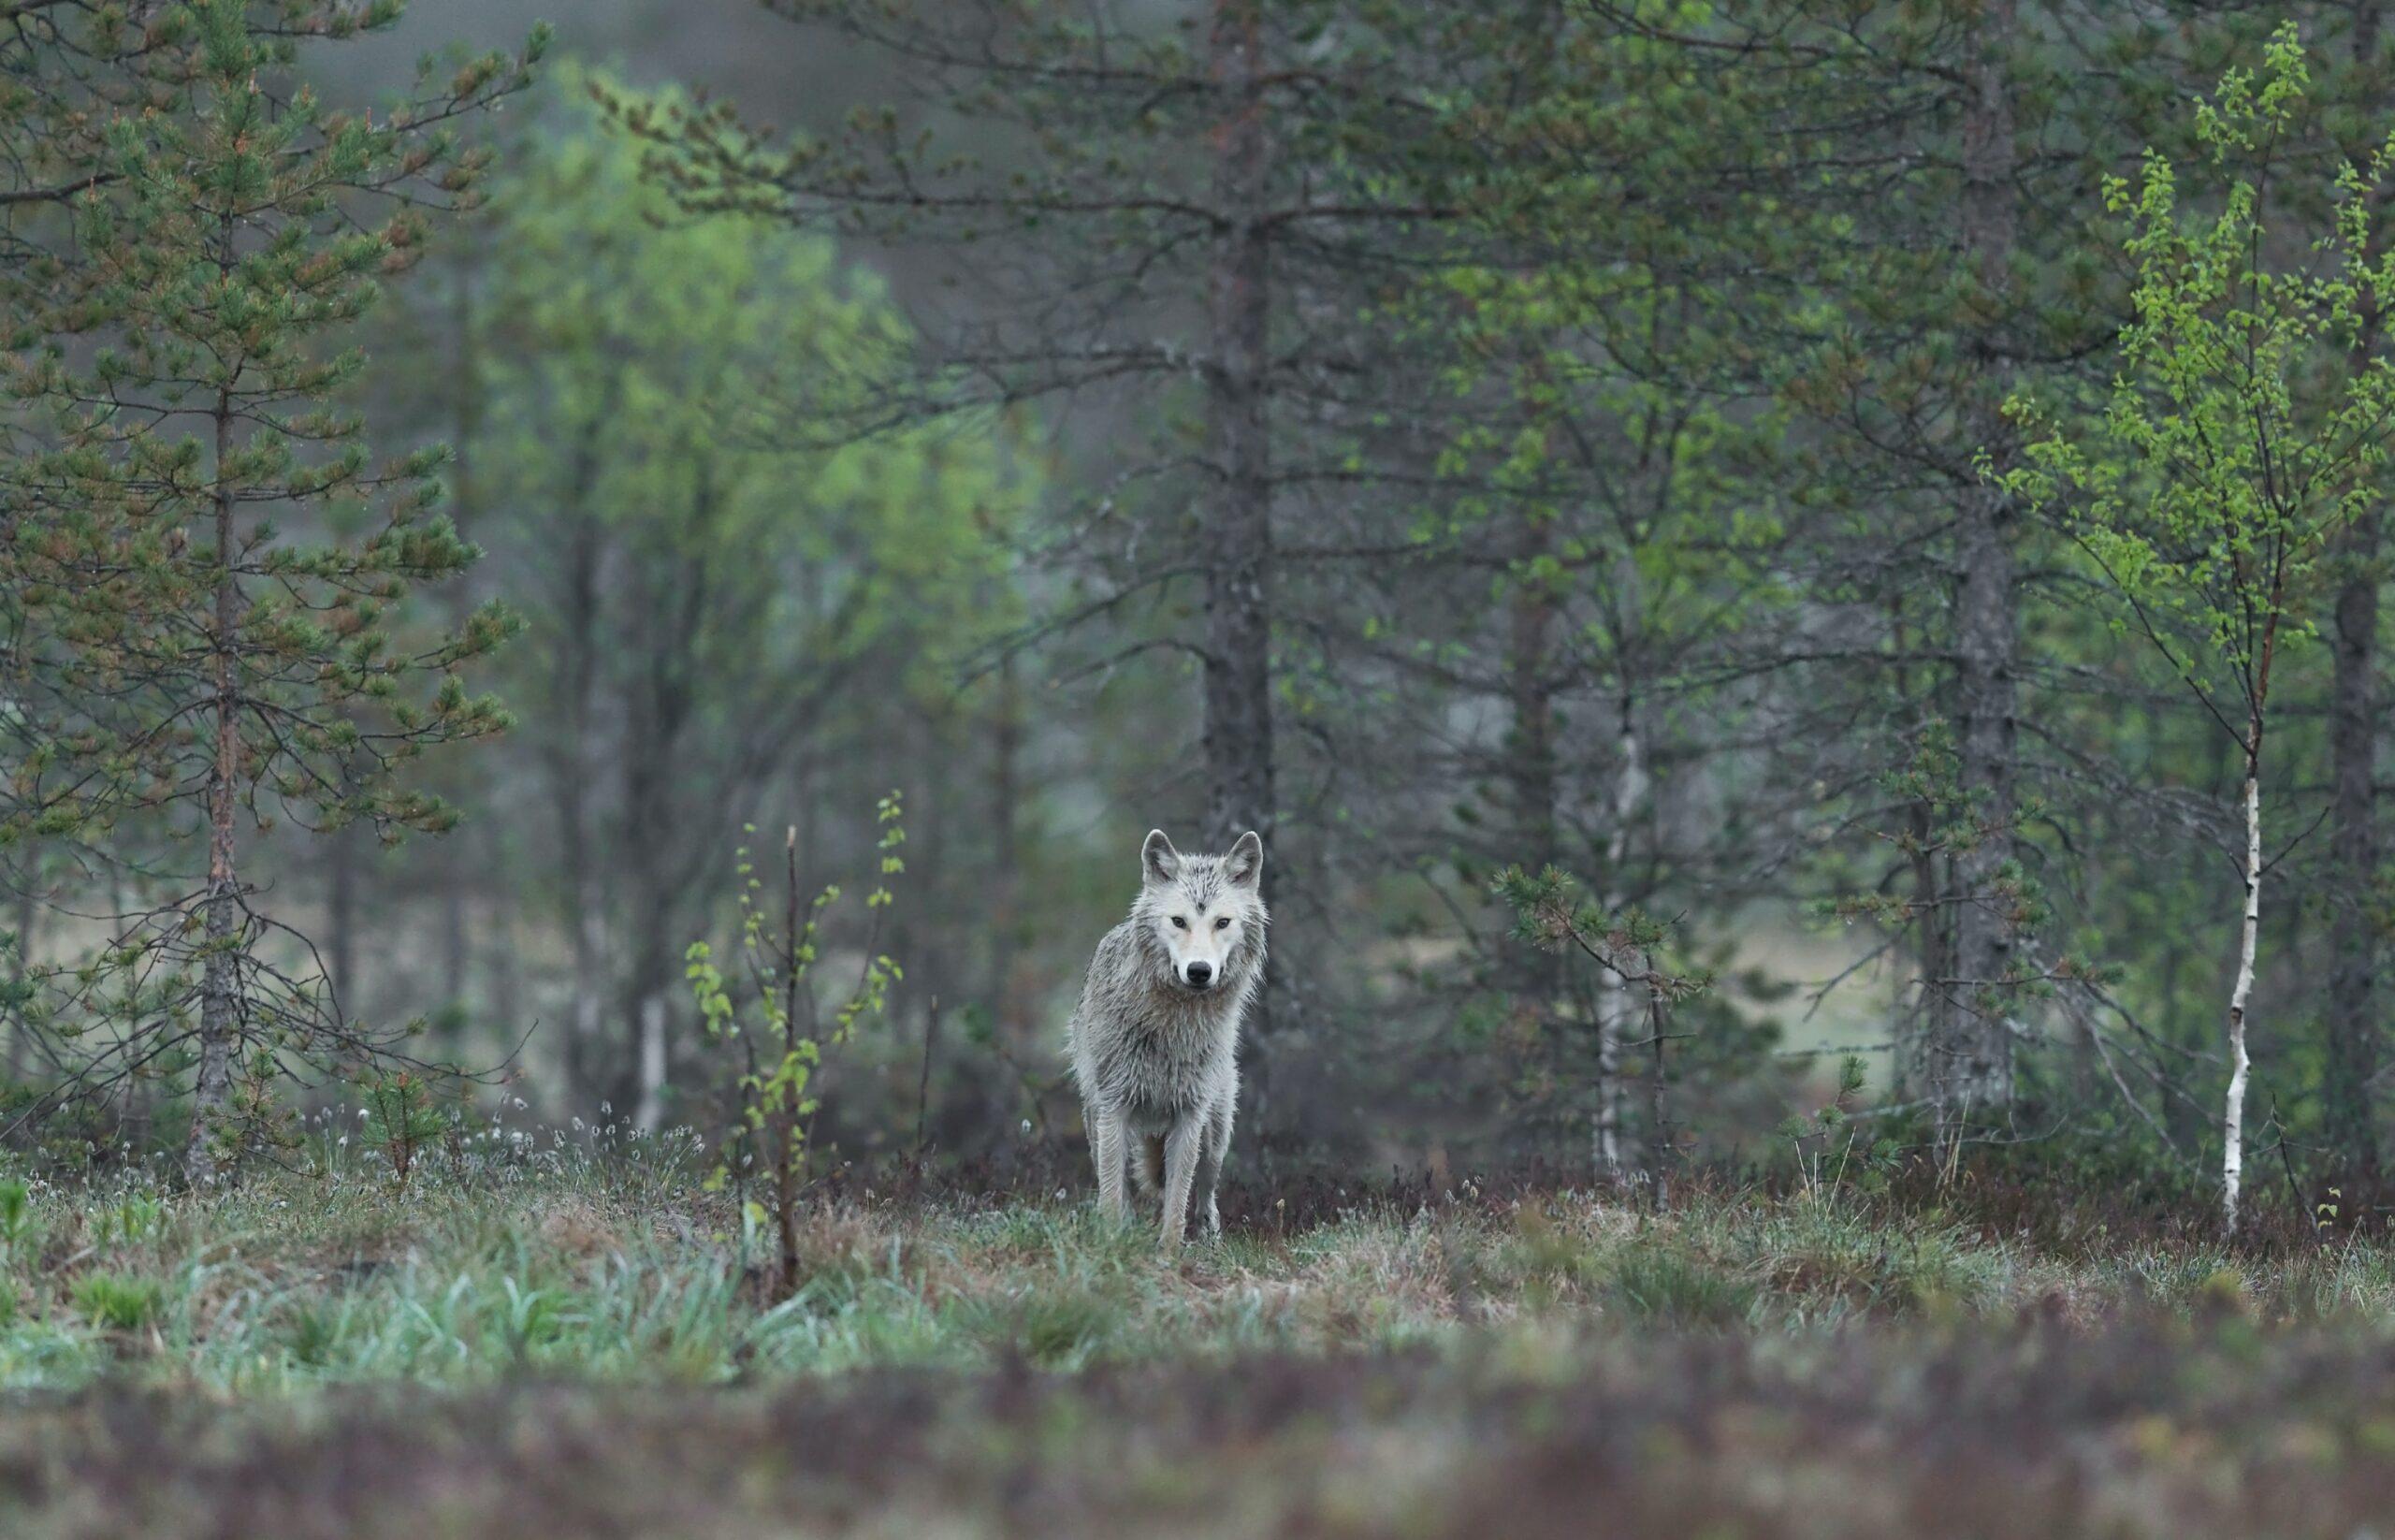 hans-veth-female wolf in field near forest edge-unsplash